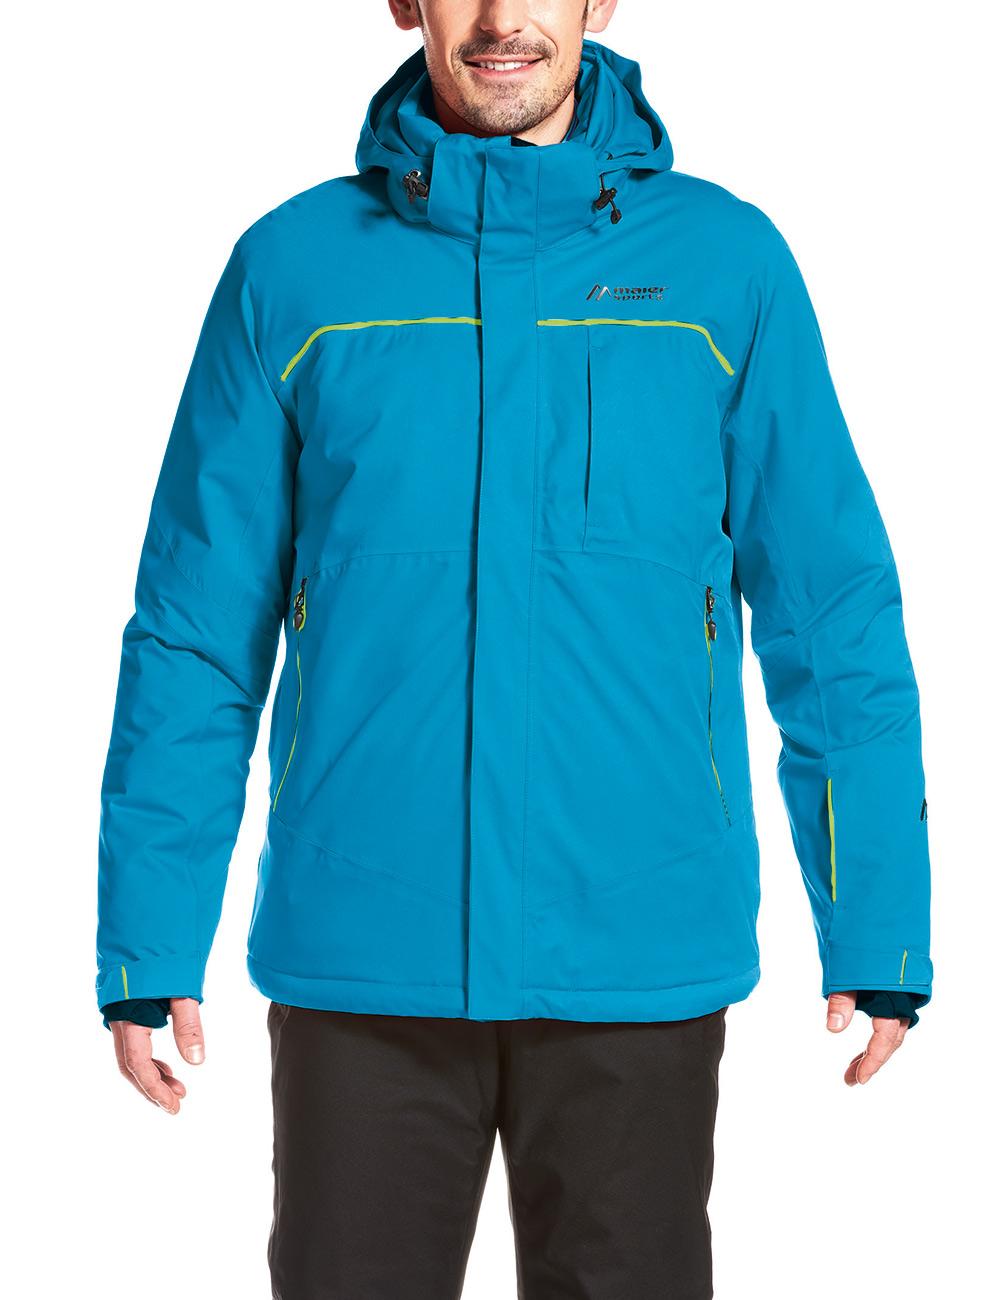 Куртка горнолыжная MAIER 2017-18 Visp M methyl blue (EUR:48)